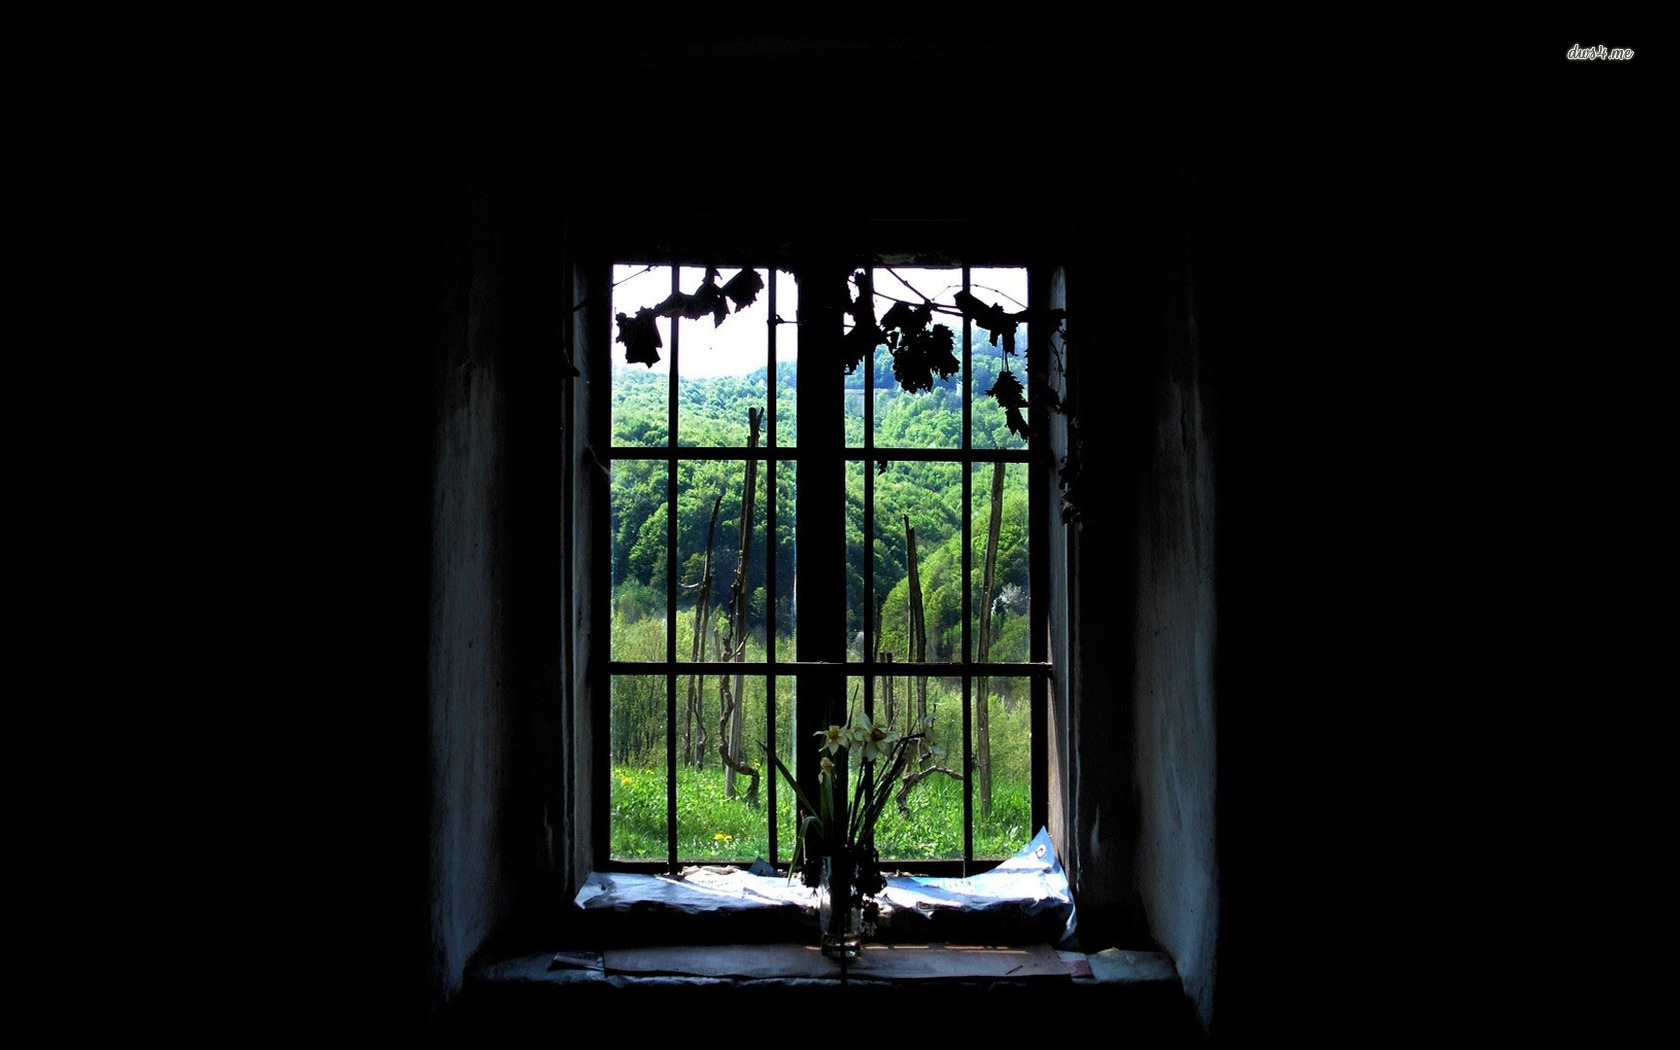 in old window wallpaper 1280x800 Daffodils in old window wallpaper 1680x1050